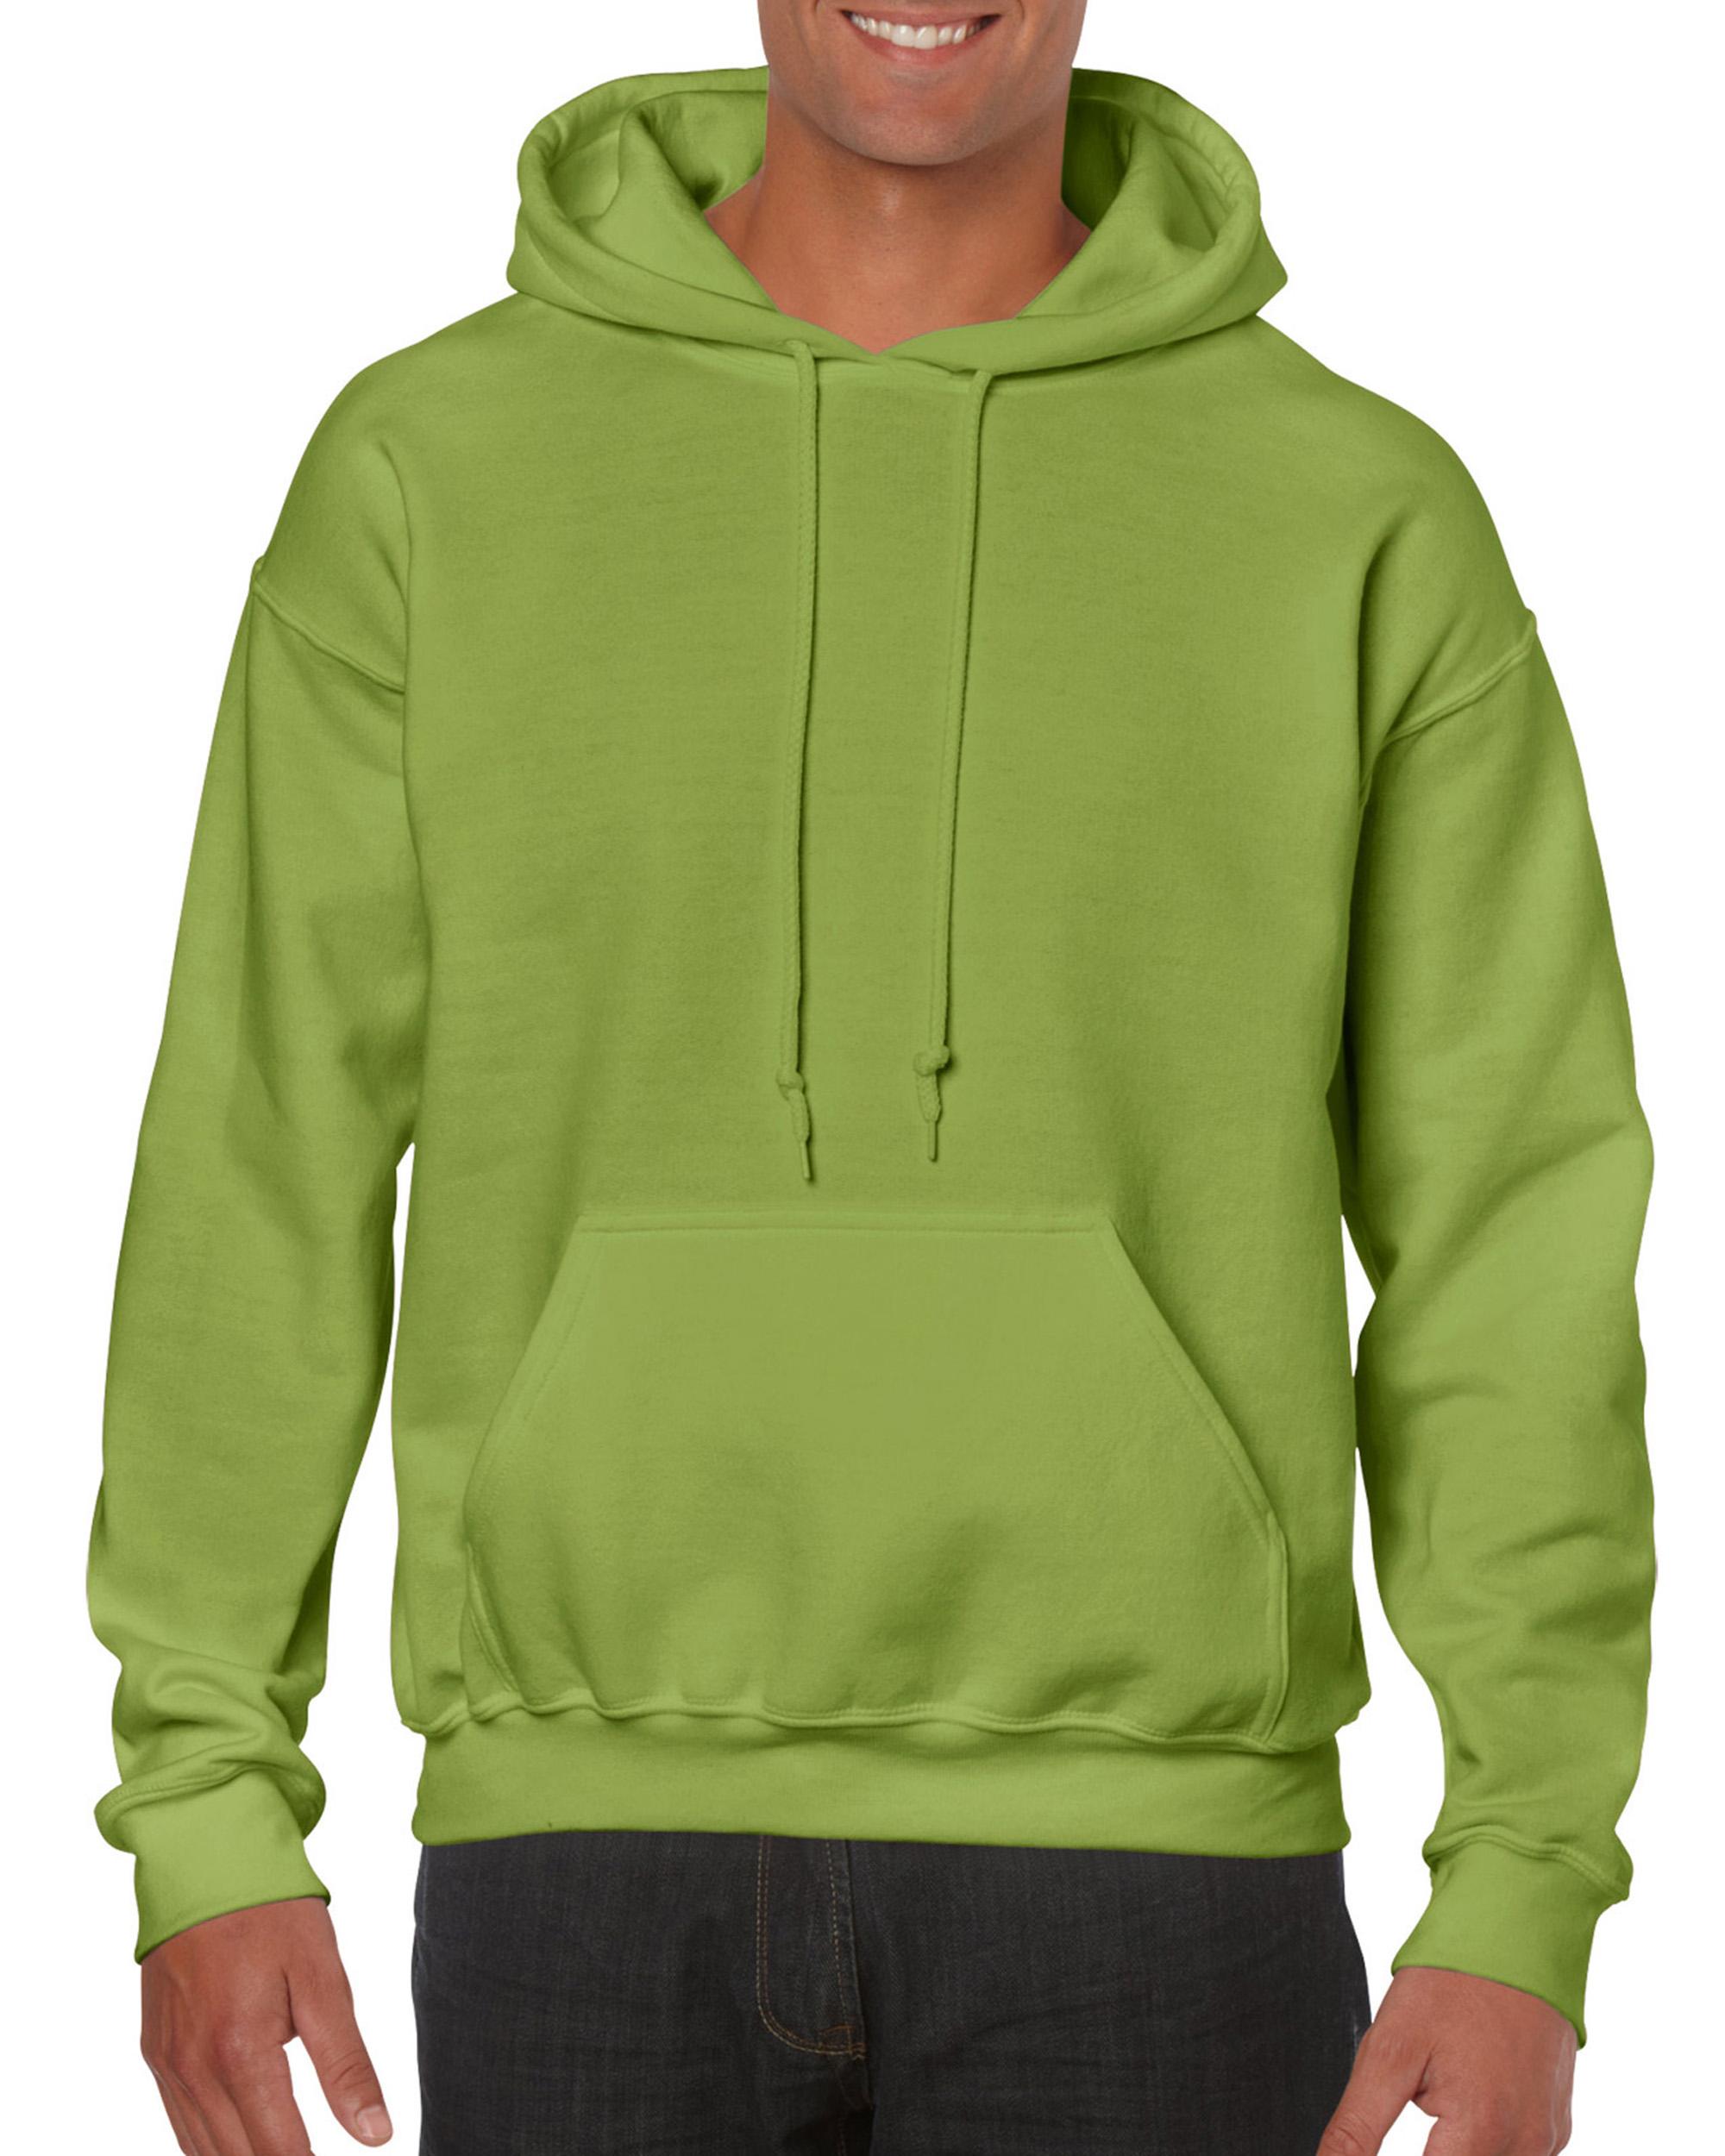 Gildan GI18500 Heavy Blend Adult Hooded Sweatshirt